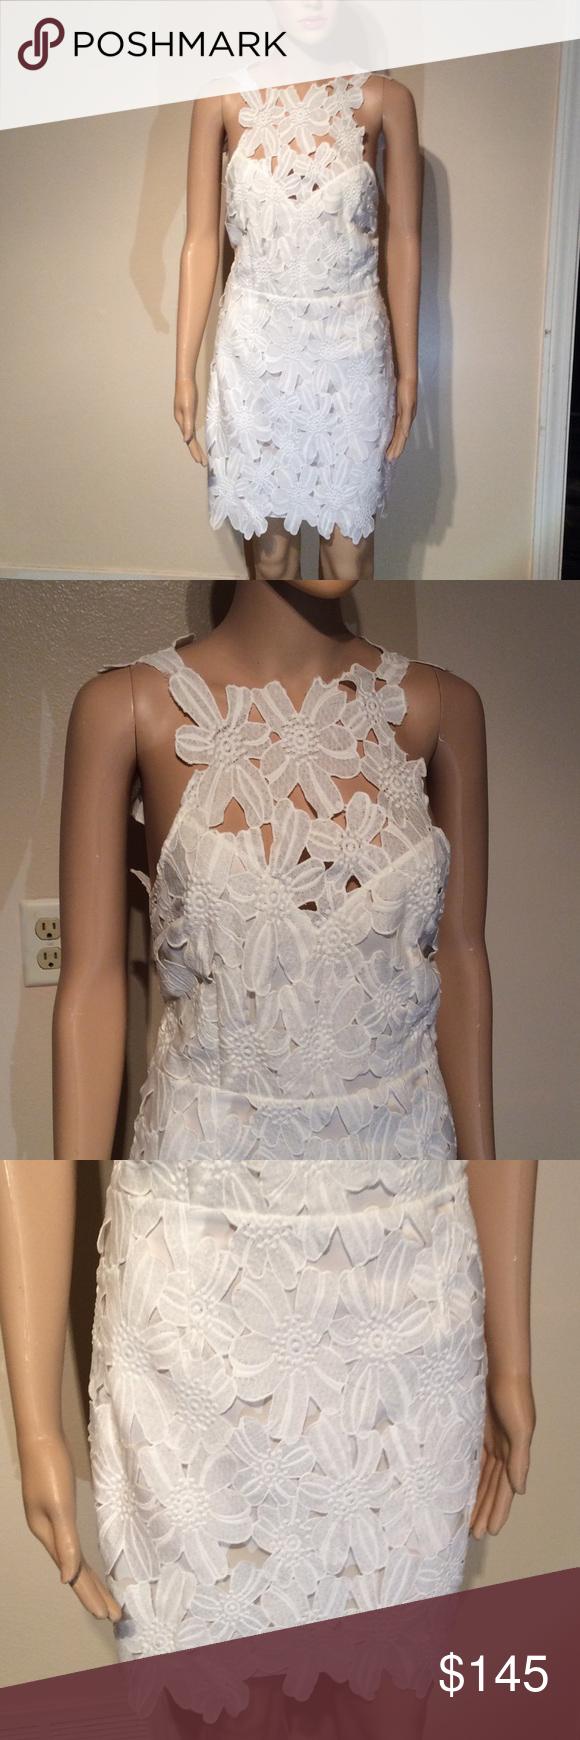 Saylor jessa foil lace dress at free people lace dress free